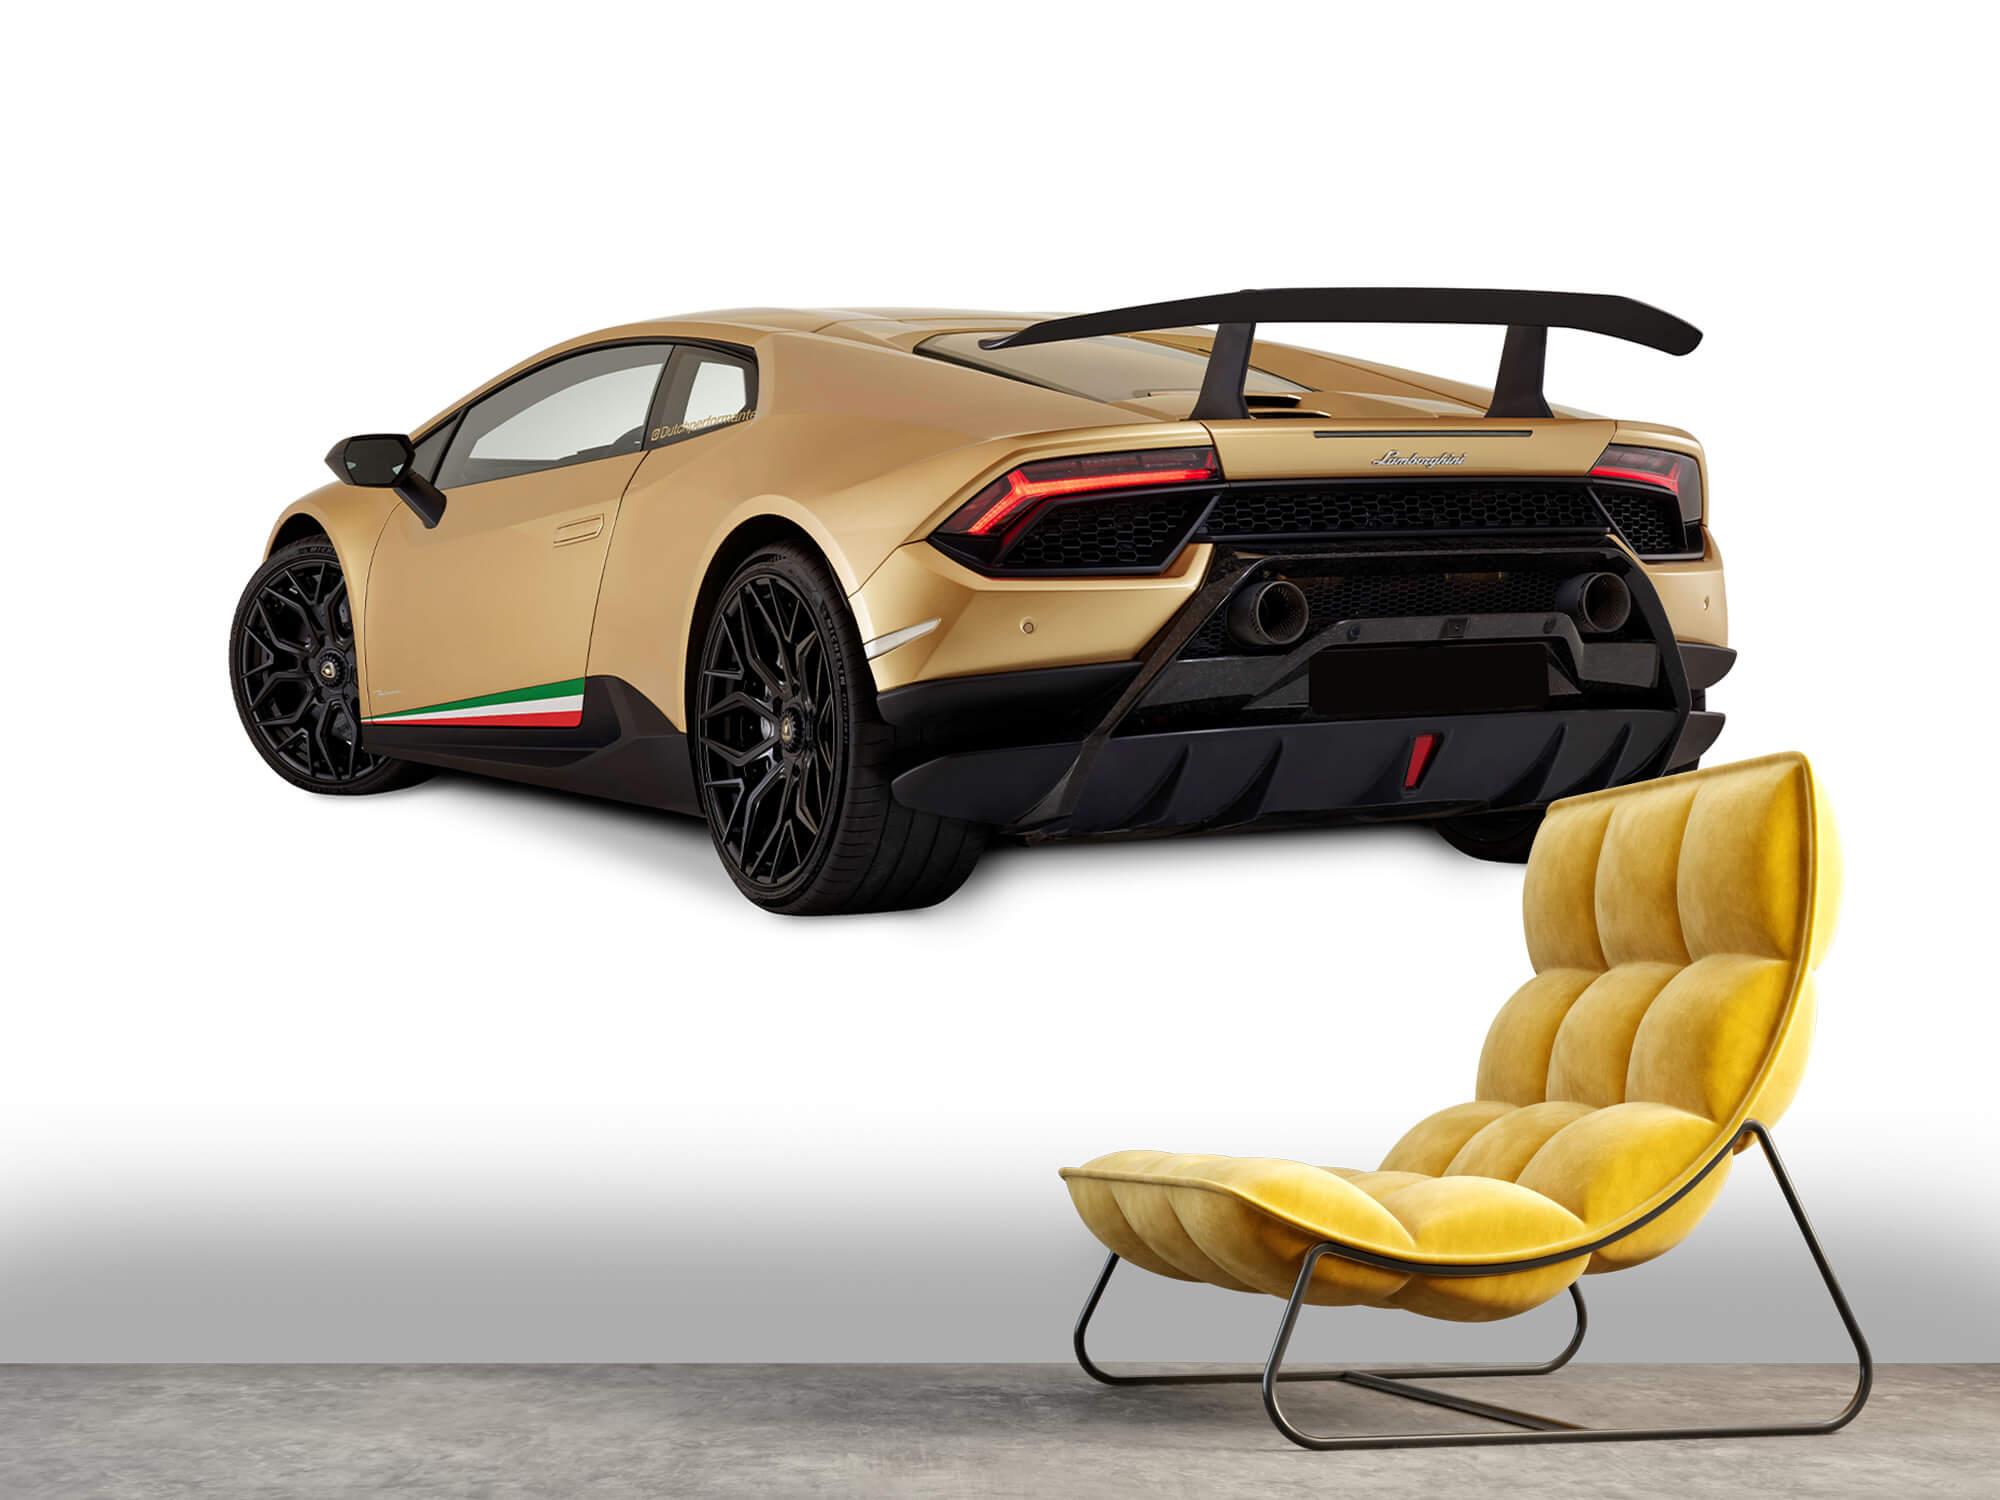 Wallpaper Lamborghini Huracán - Côté arrière gauche, blanc 11